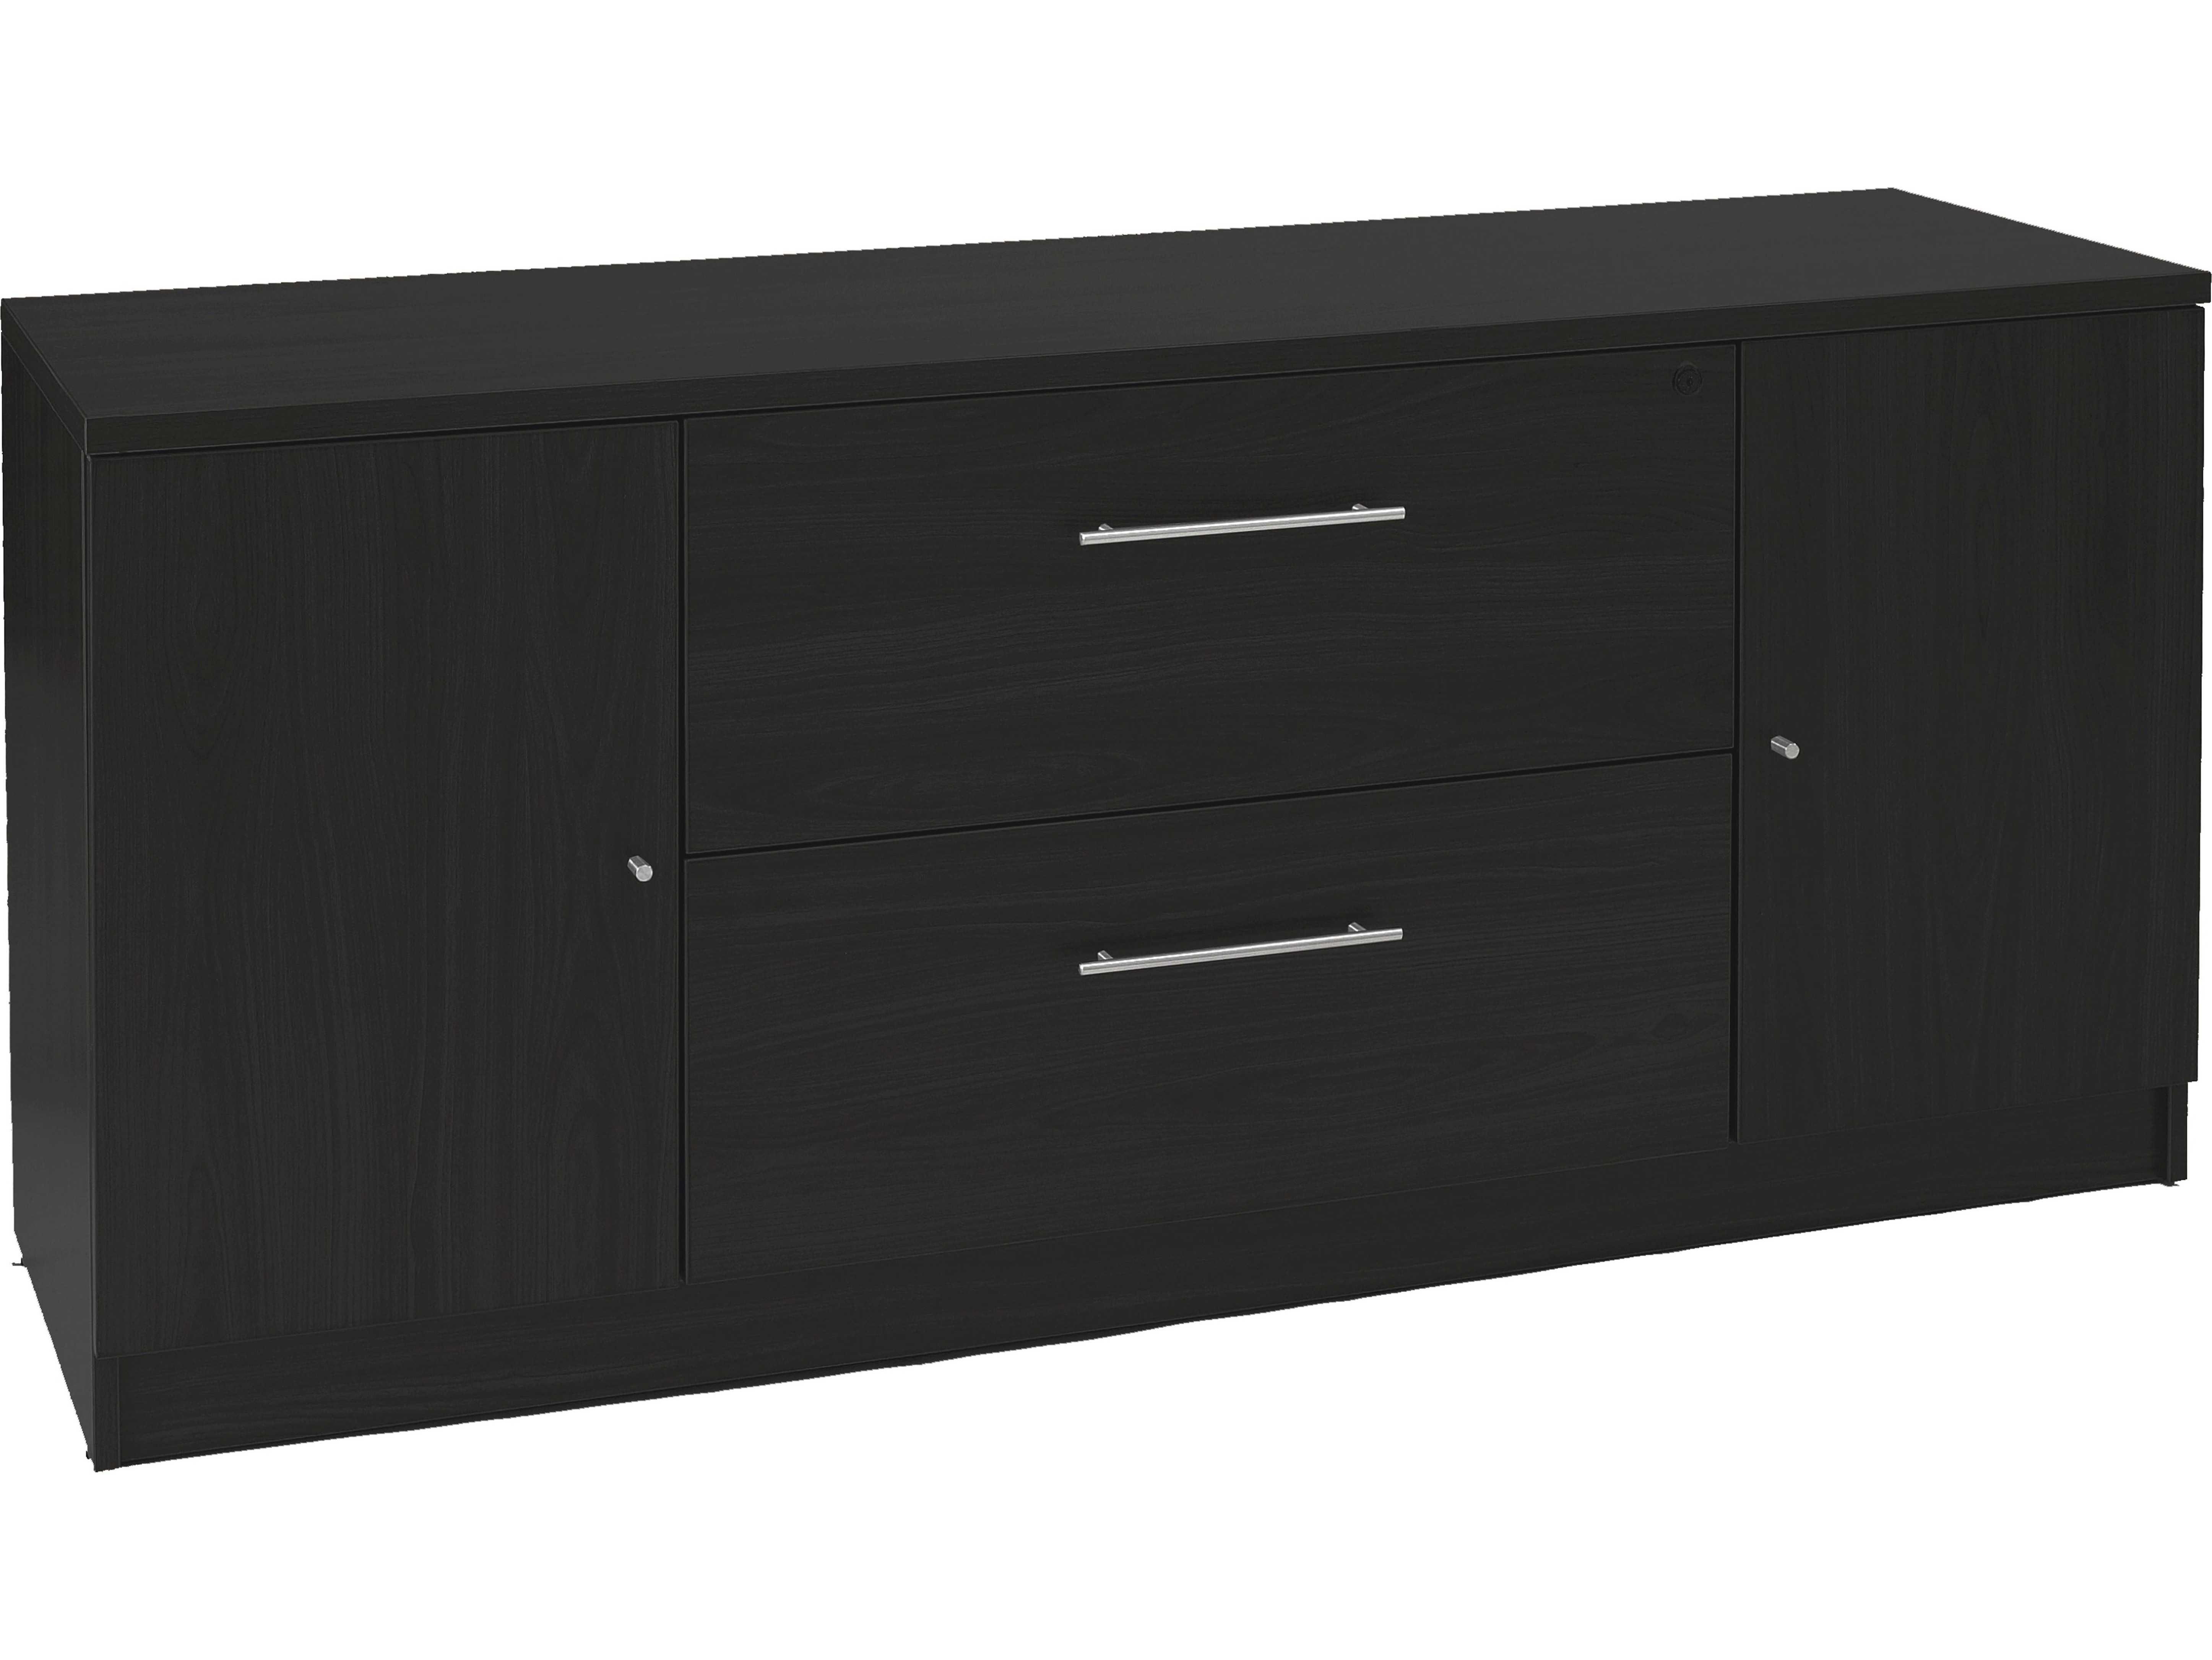 Unique Furniture 100 Series Espresso Credenza File Cabinet With Southwest Pink Credenzas (View 29 of 30)